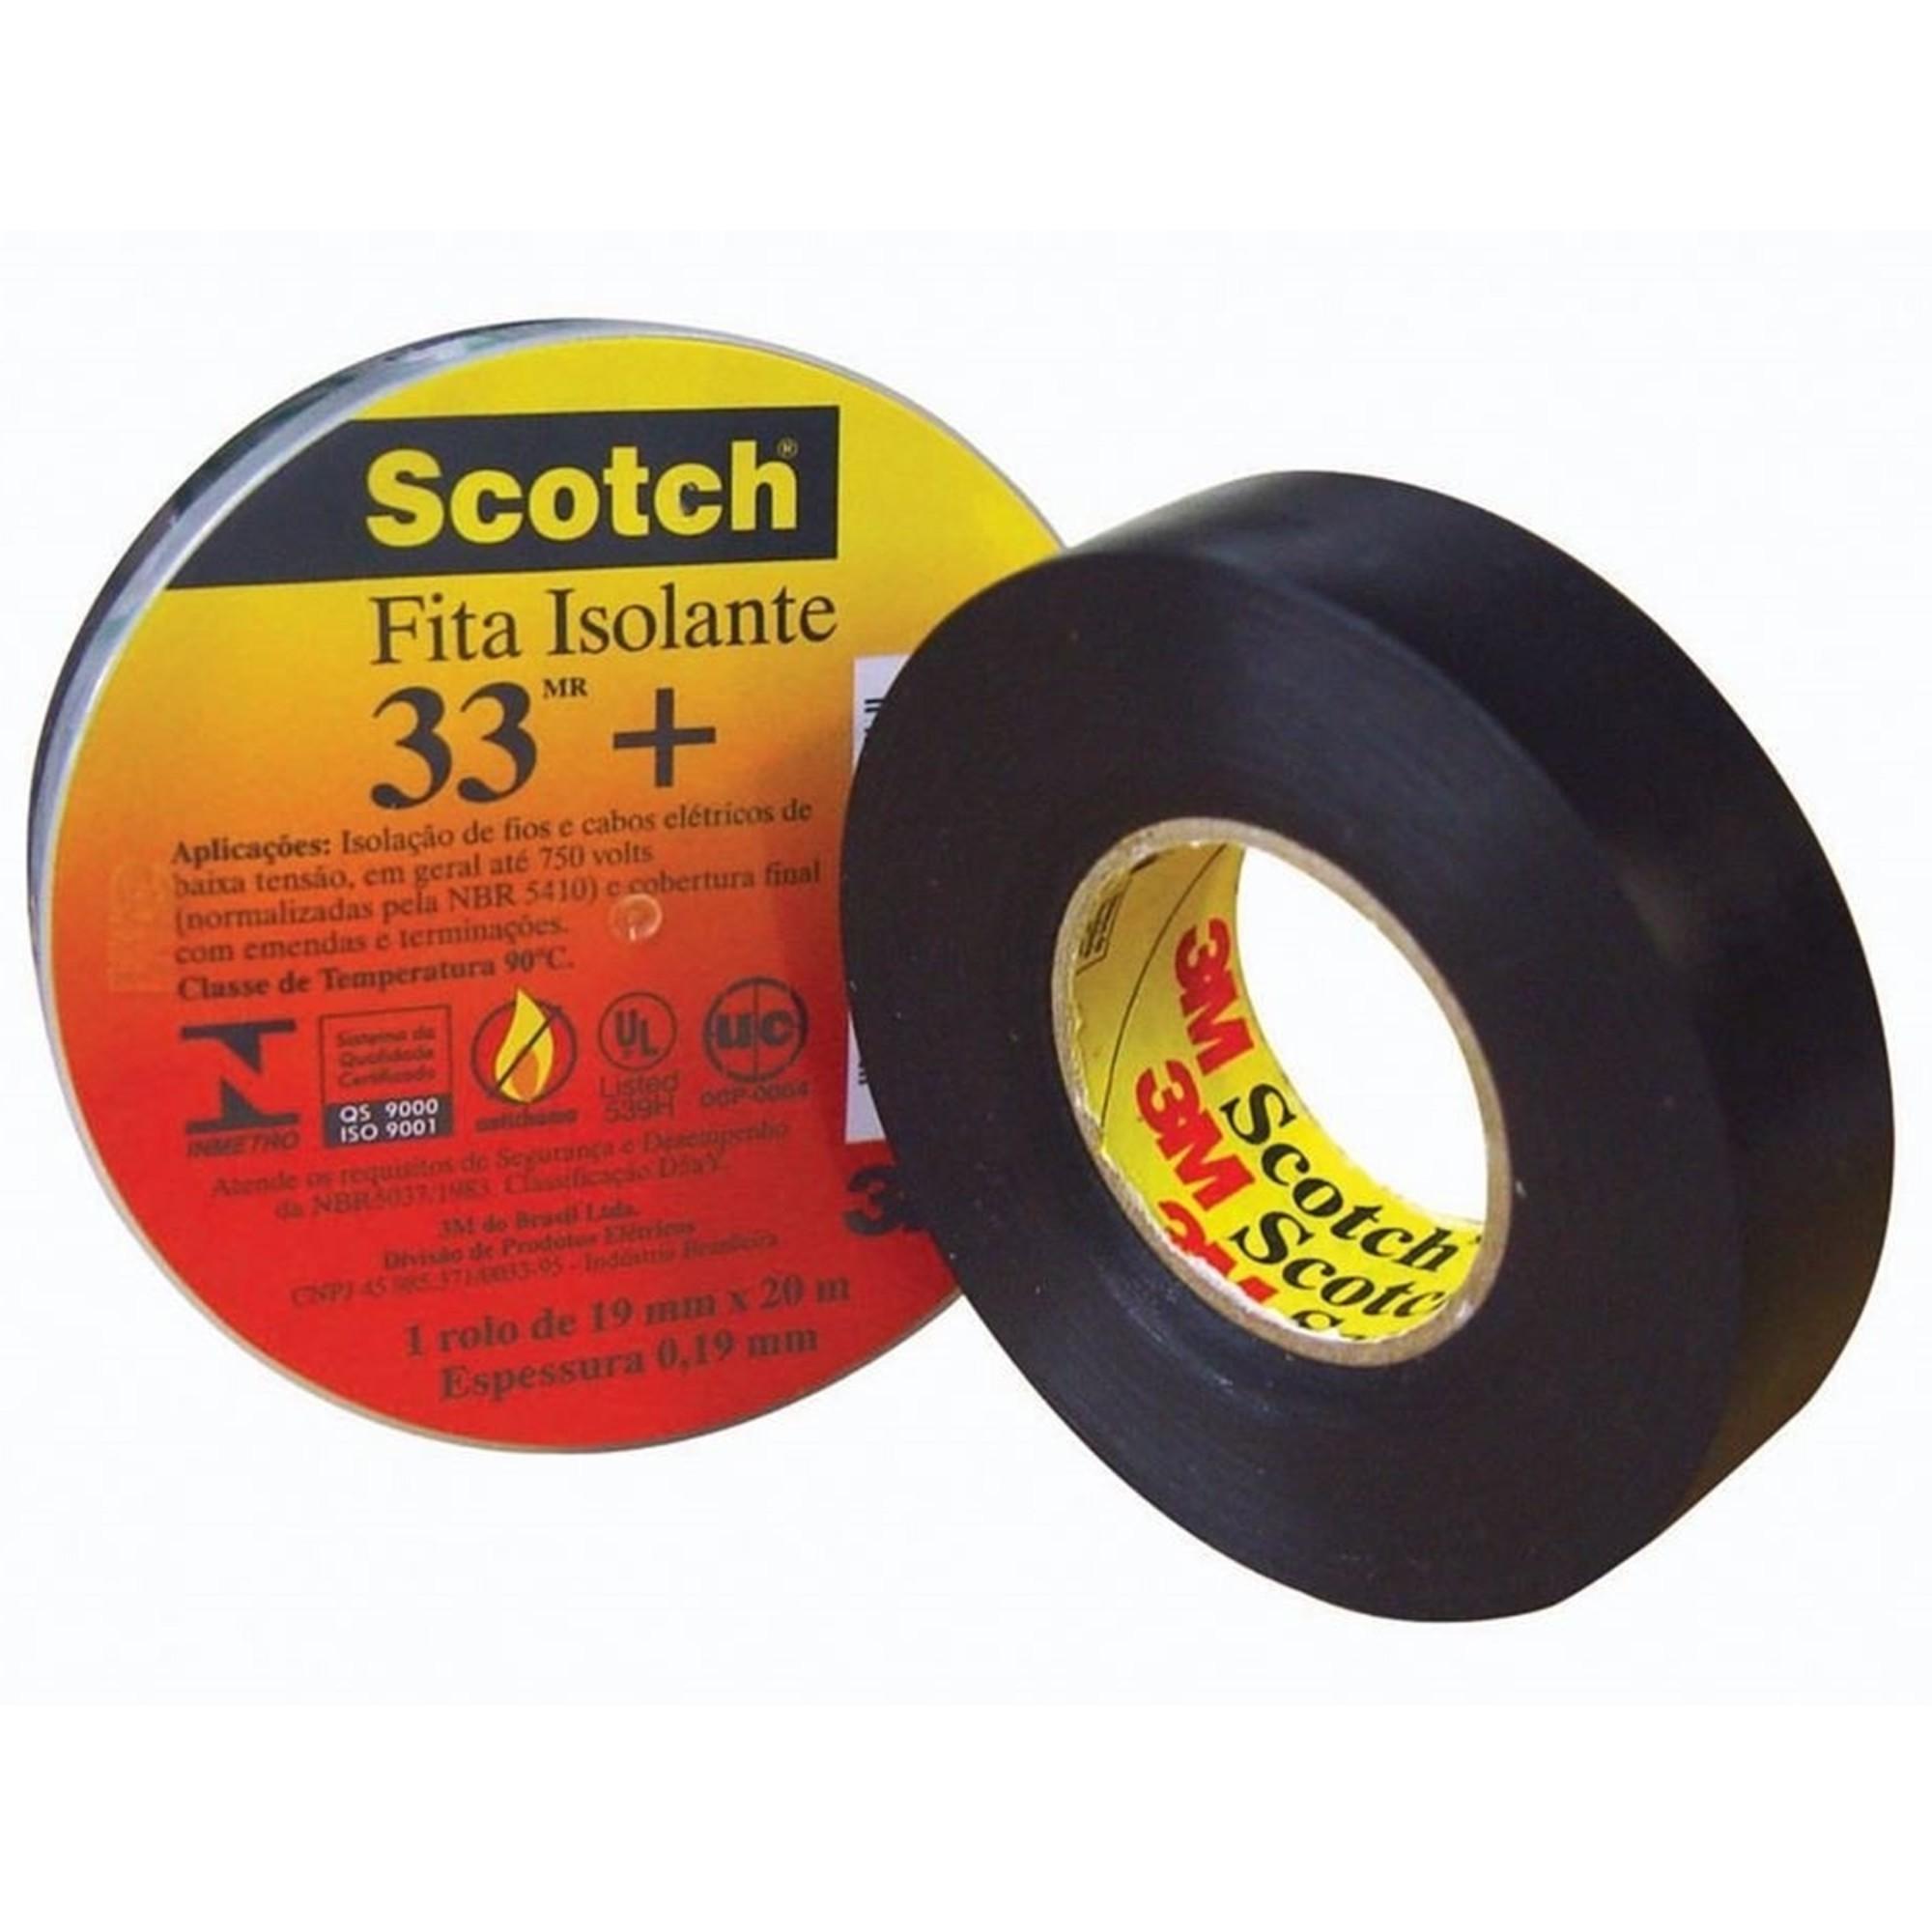 Fita Isolante Profissional 3M 33+ Scotch 105°c 20 Metros